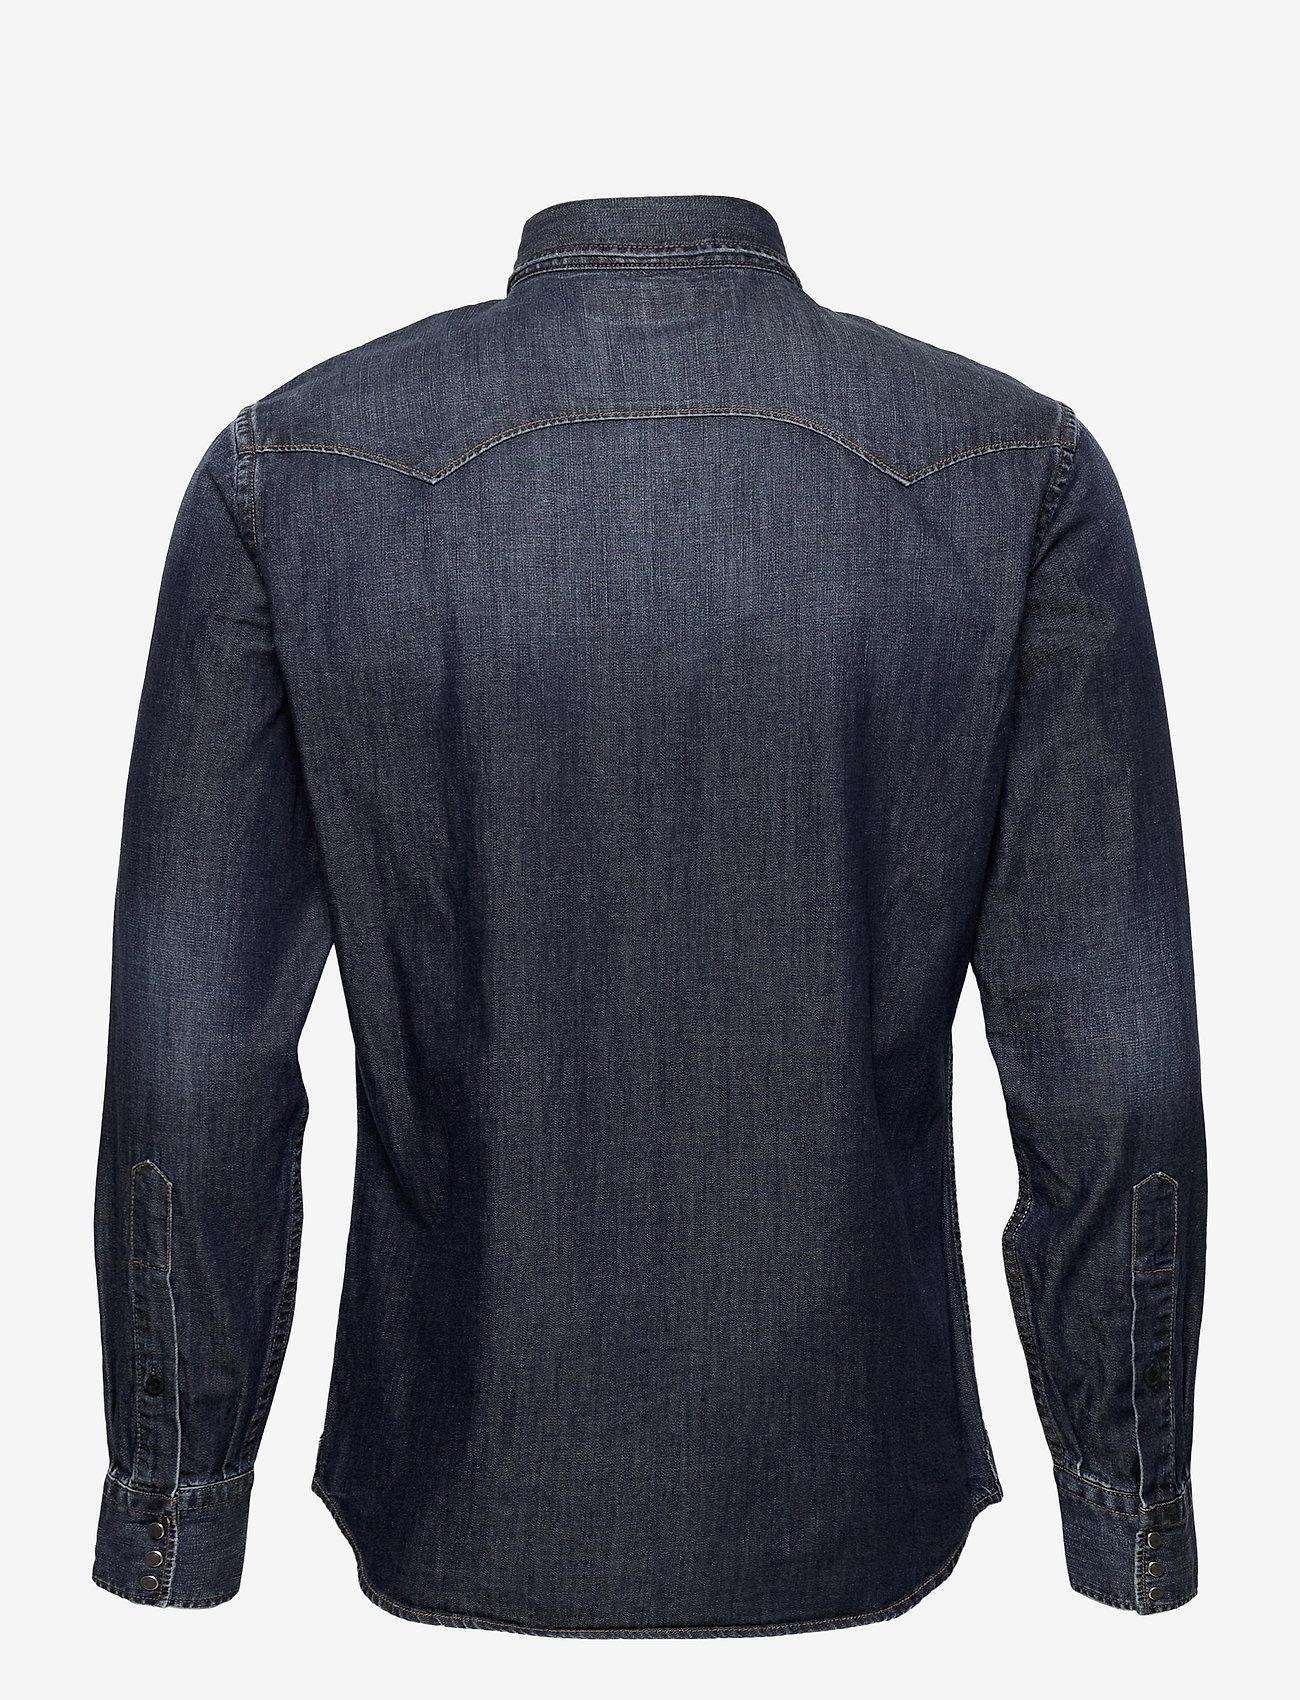 Replay - Shirt - peruspaitoja - dark blue - 1